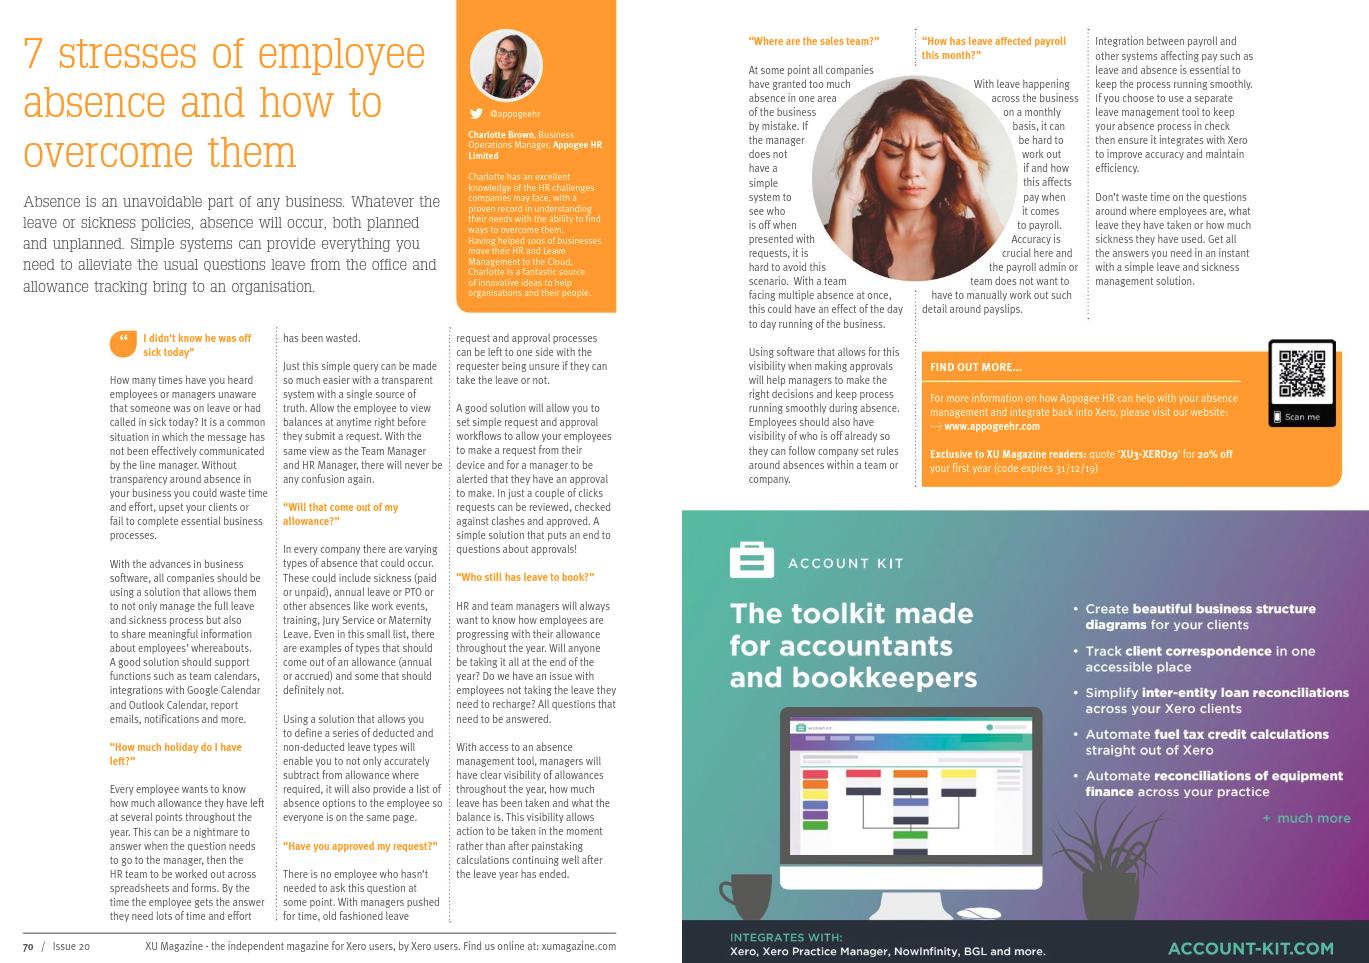 XU Magazine article 7 Stresses of Employee Absence